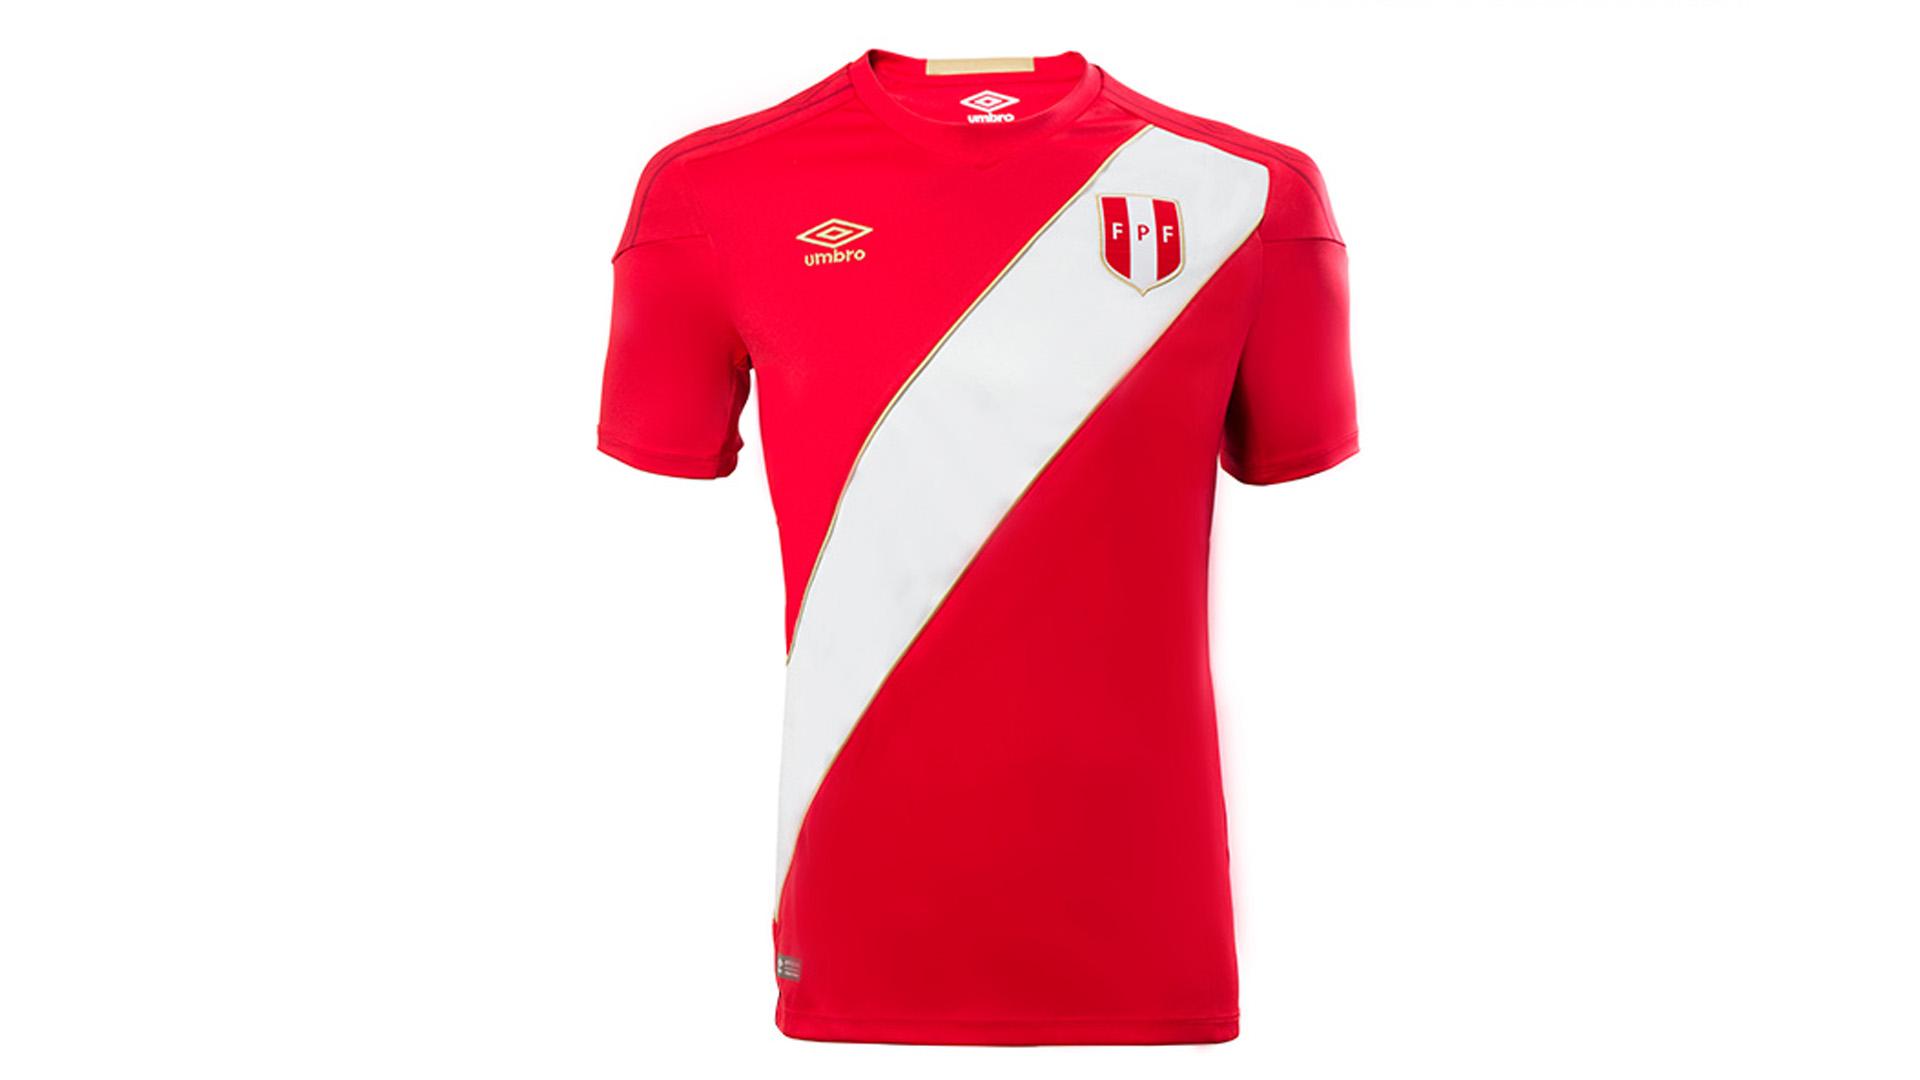 Peru Camiseta Alternativa Away Jersey 2018